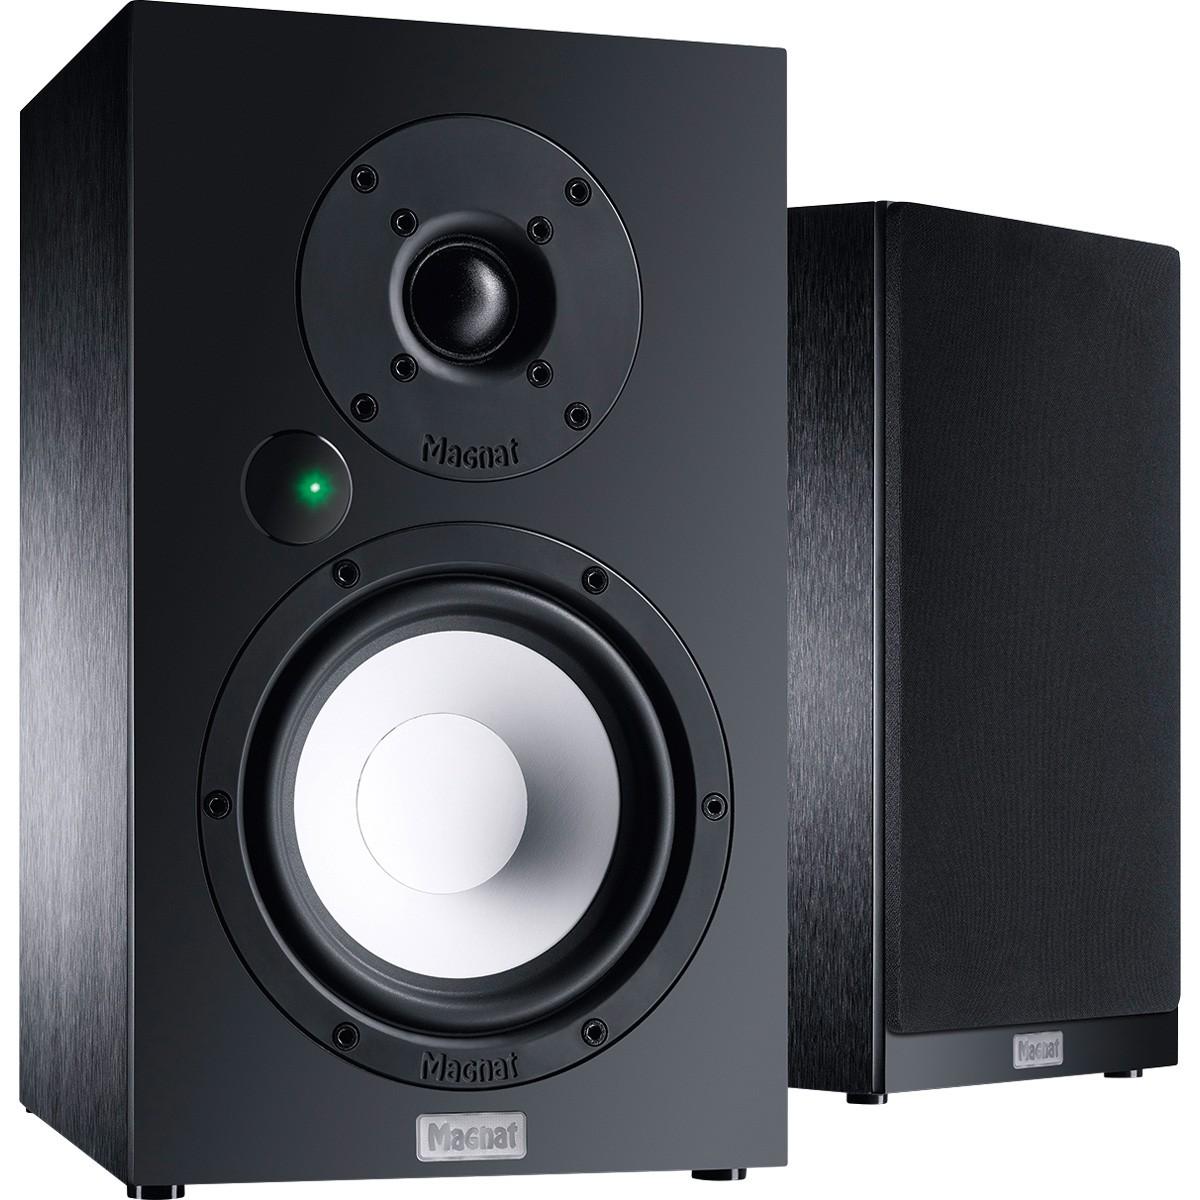 Magnat Multi Monitor 220 Vollaktives Bluetooth®-Stereolautsprecher-Set / Paar